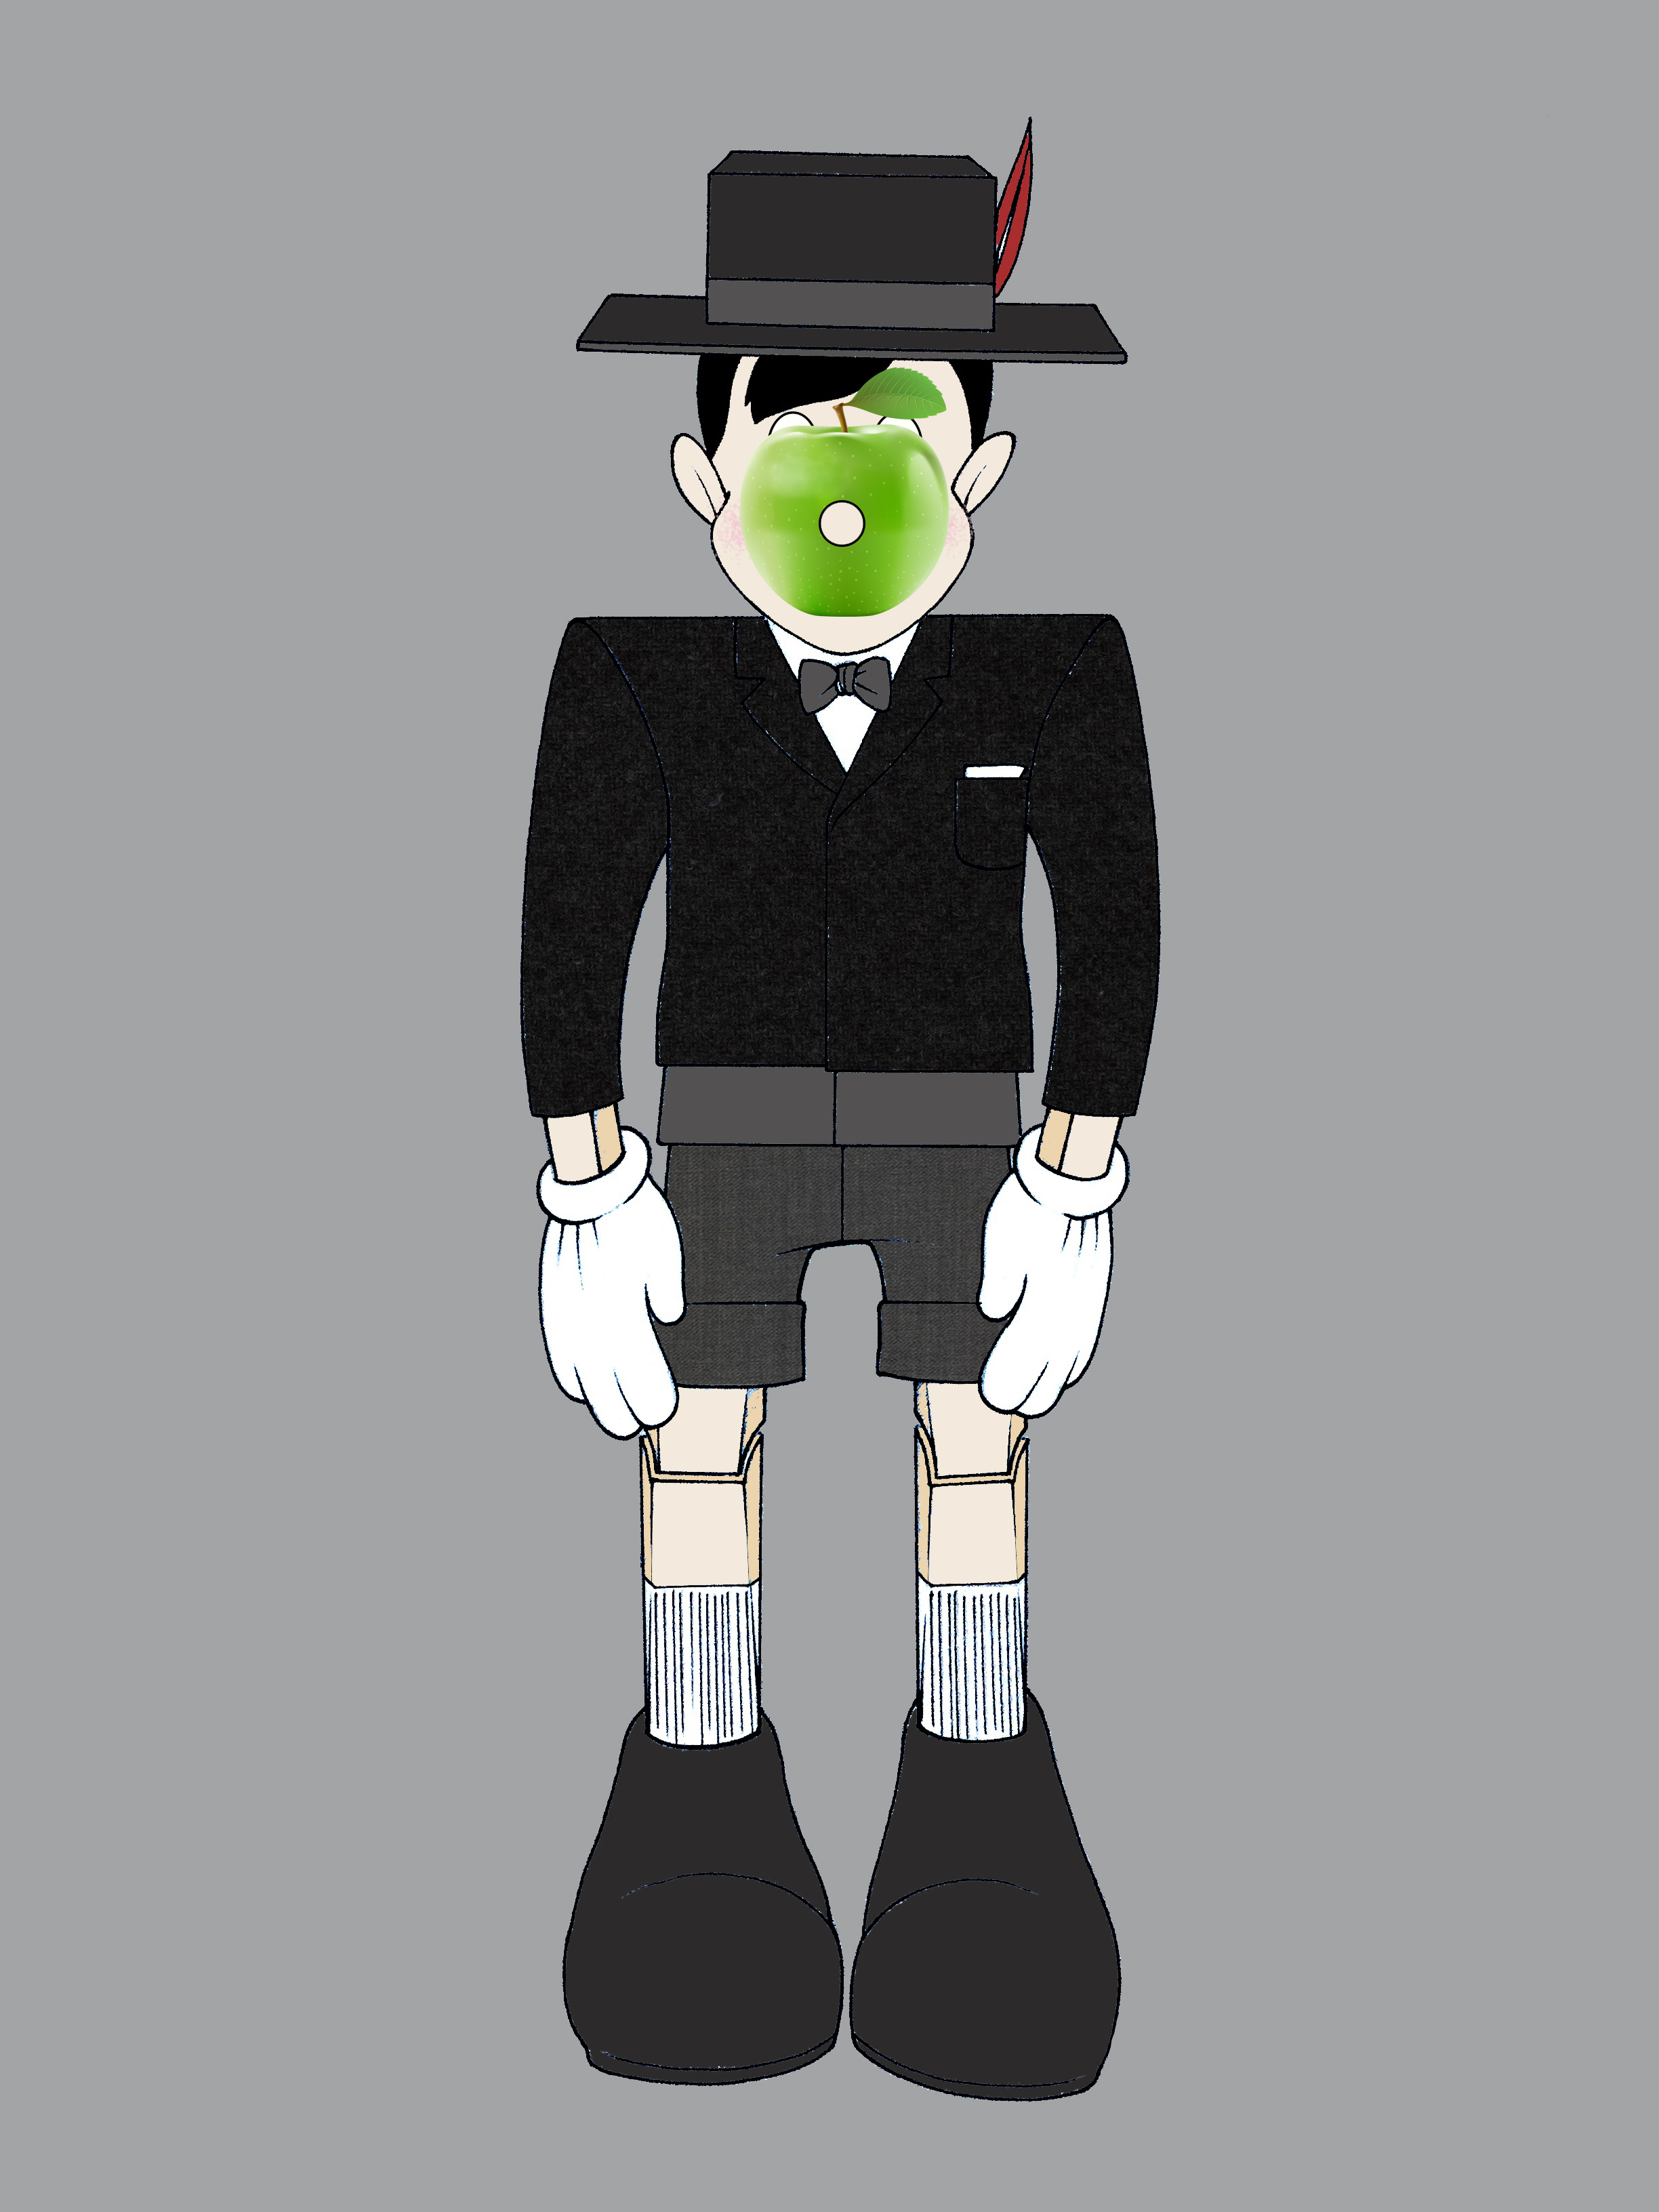 Thom Browne| Pinocchio 0.3 (color) Apple.jpg